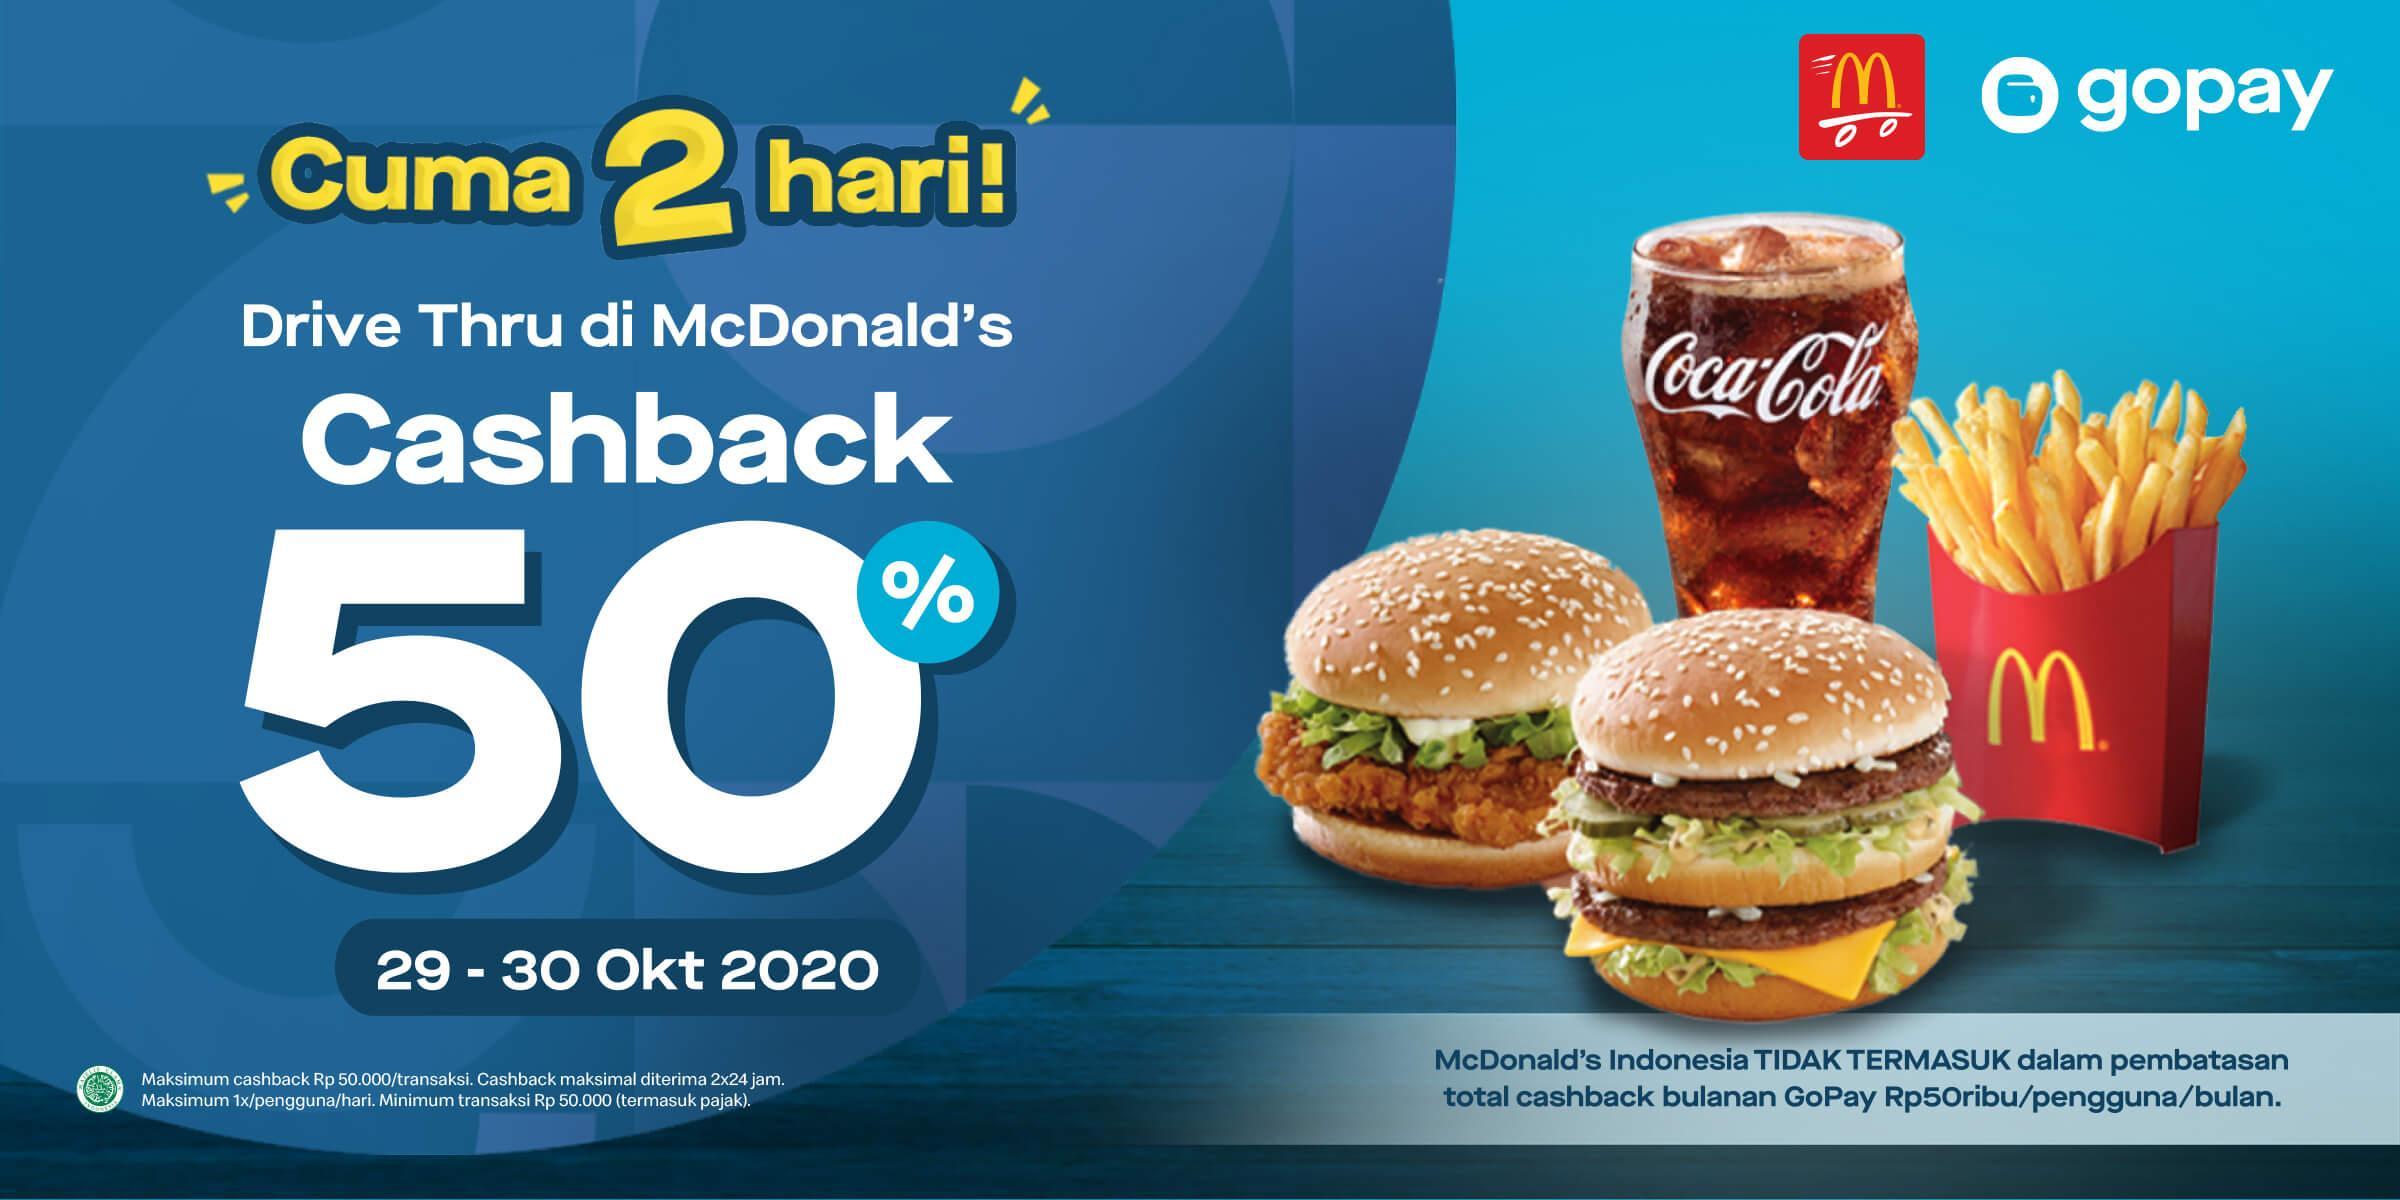 Mcdonald S Indonesia Gopay Cashback 50